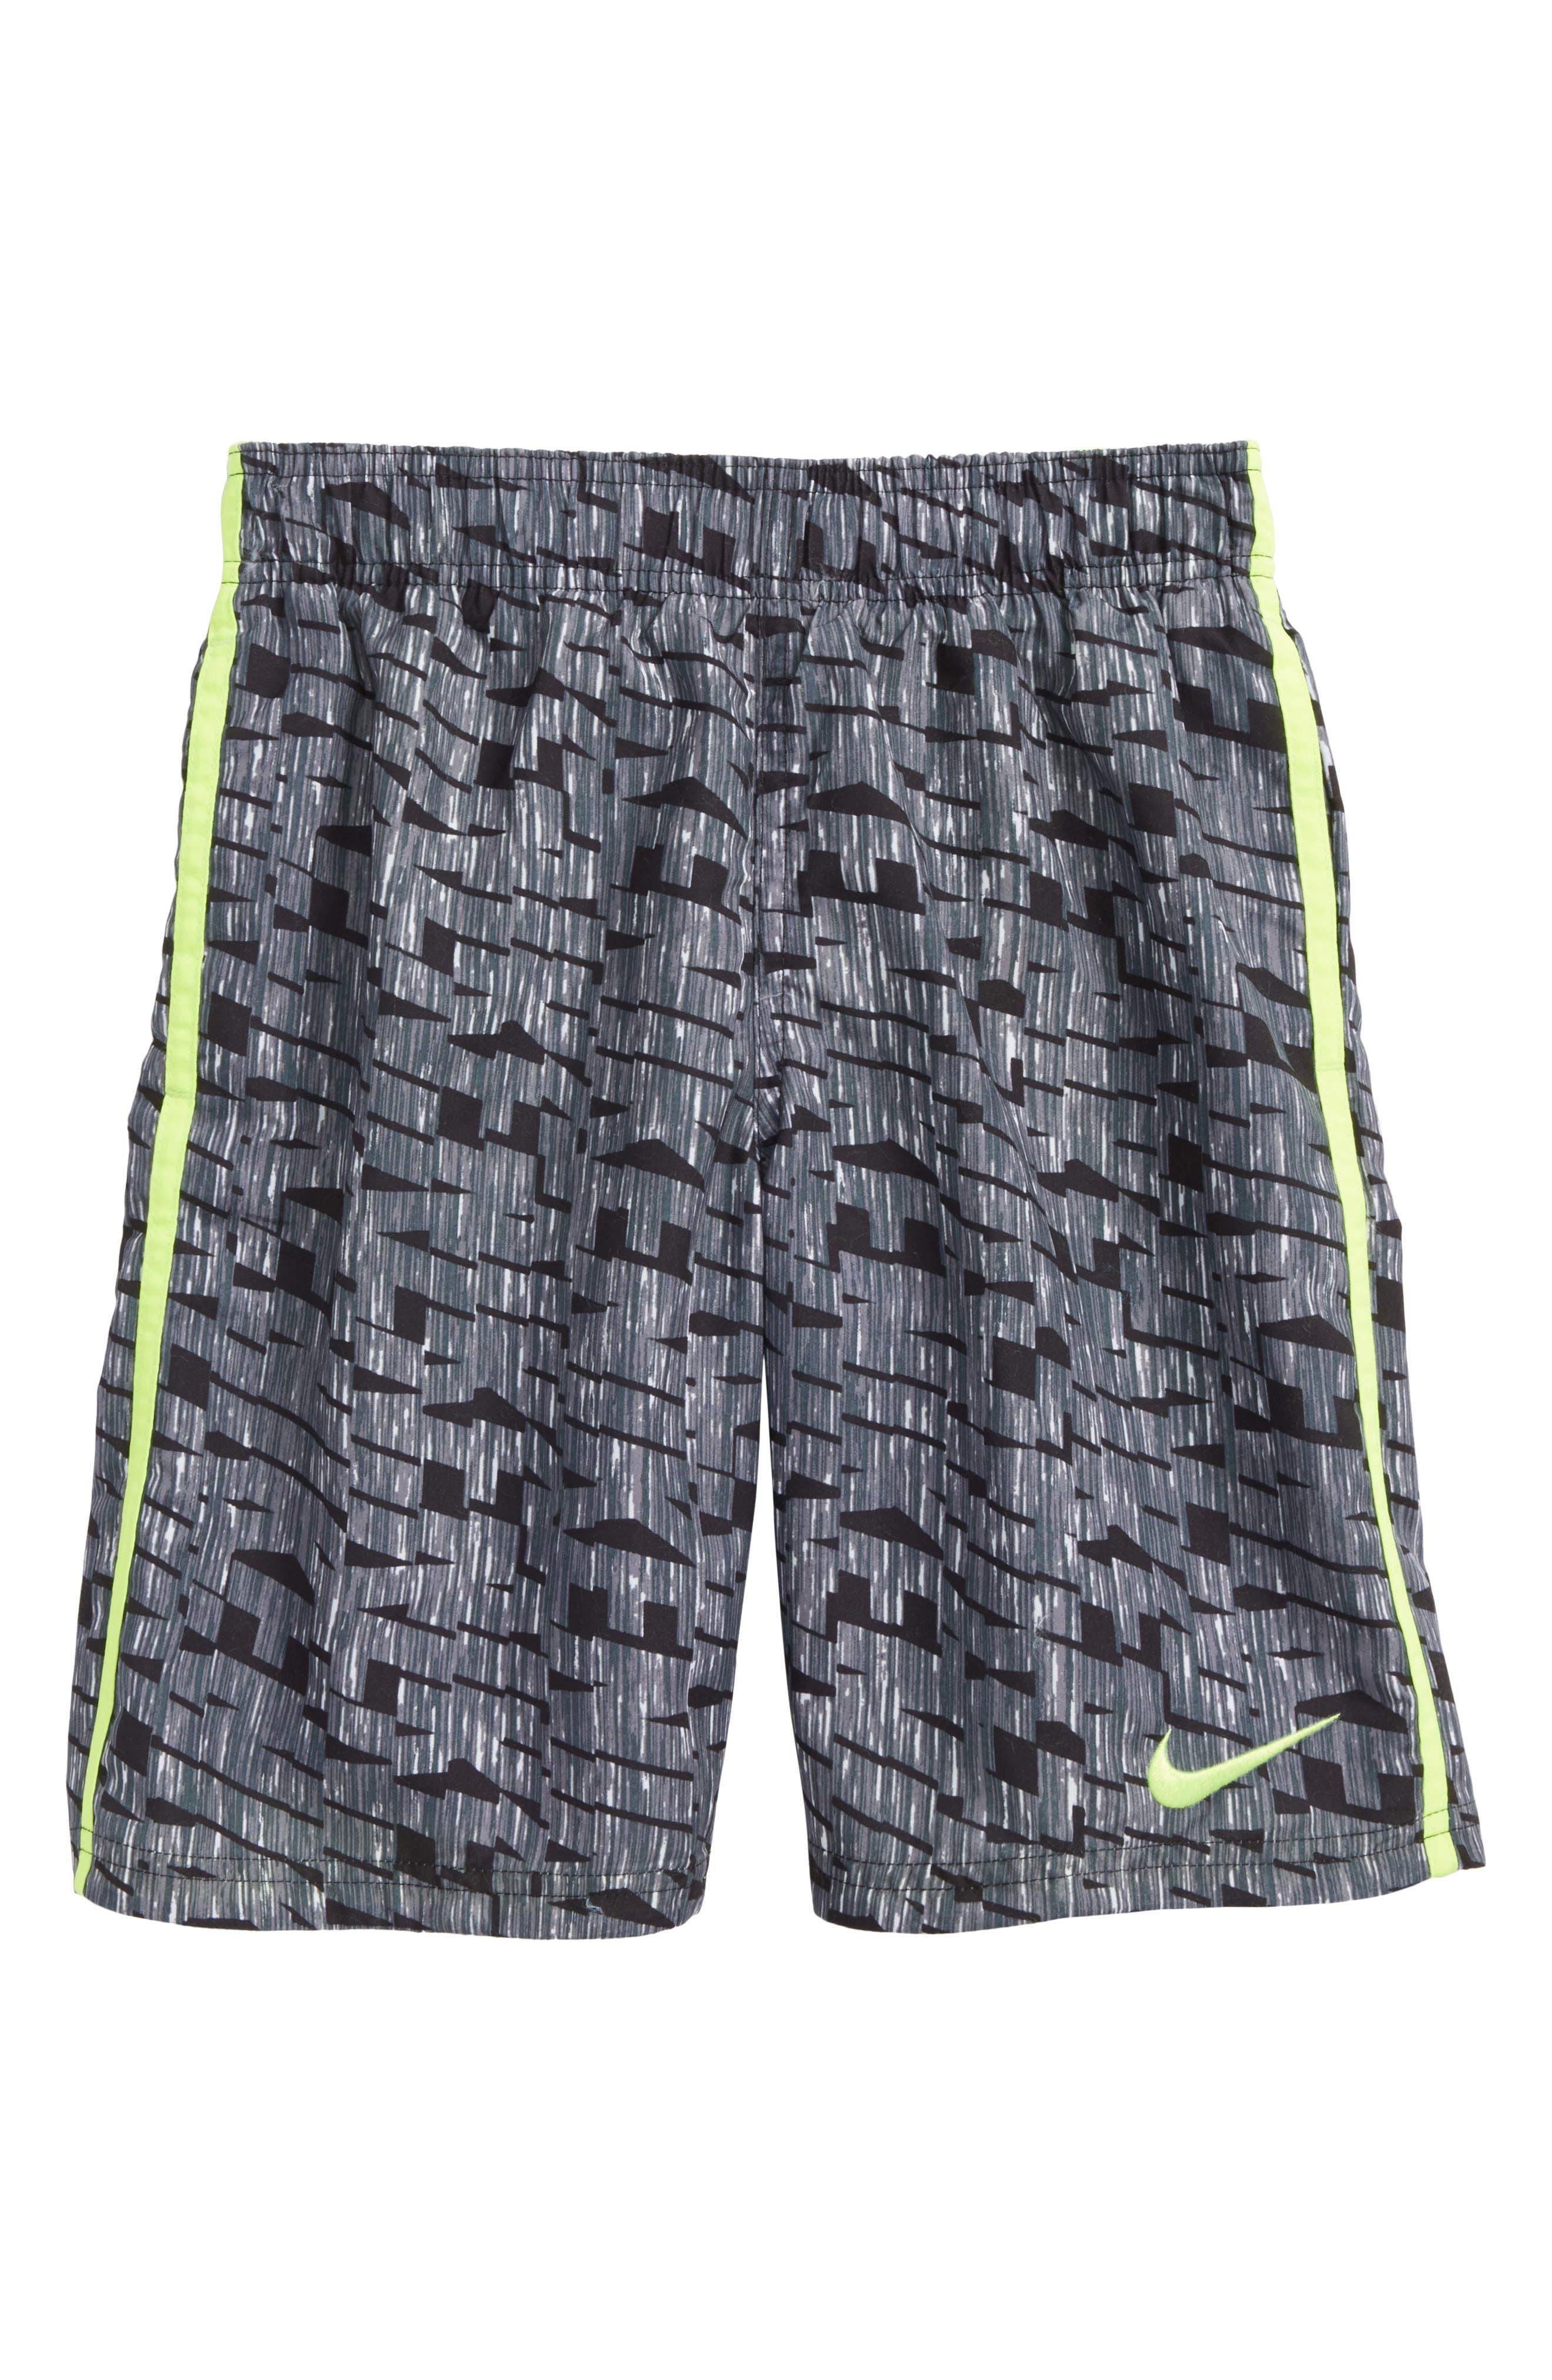 Diverge Volley Shorts,                             Main thumbnail 1, color,                             Black